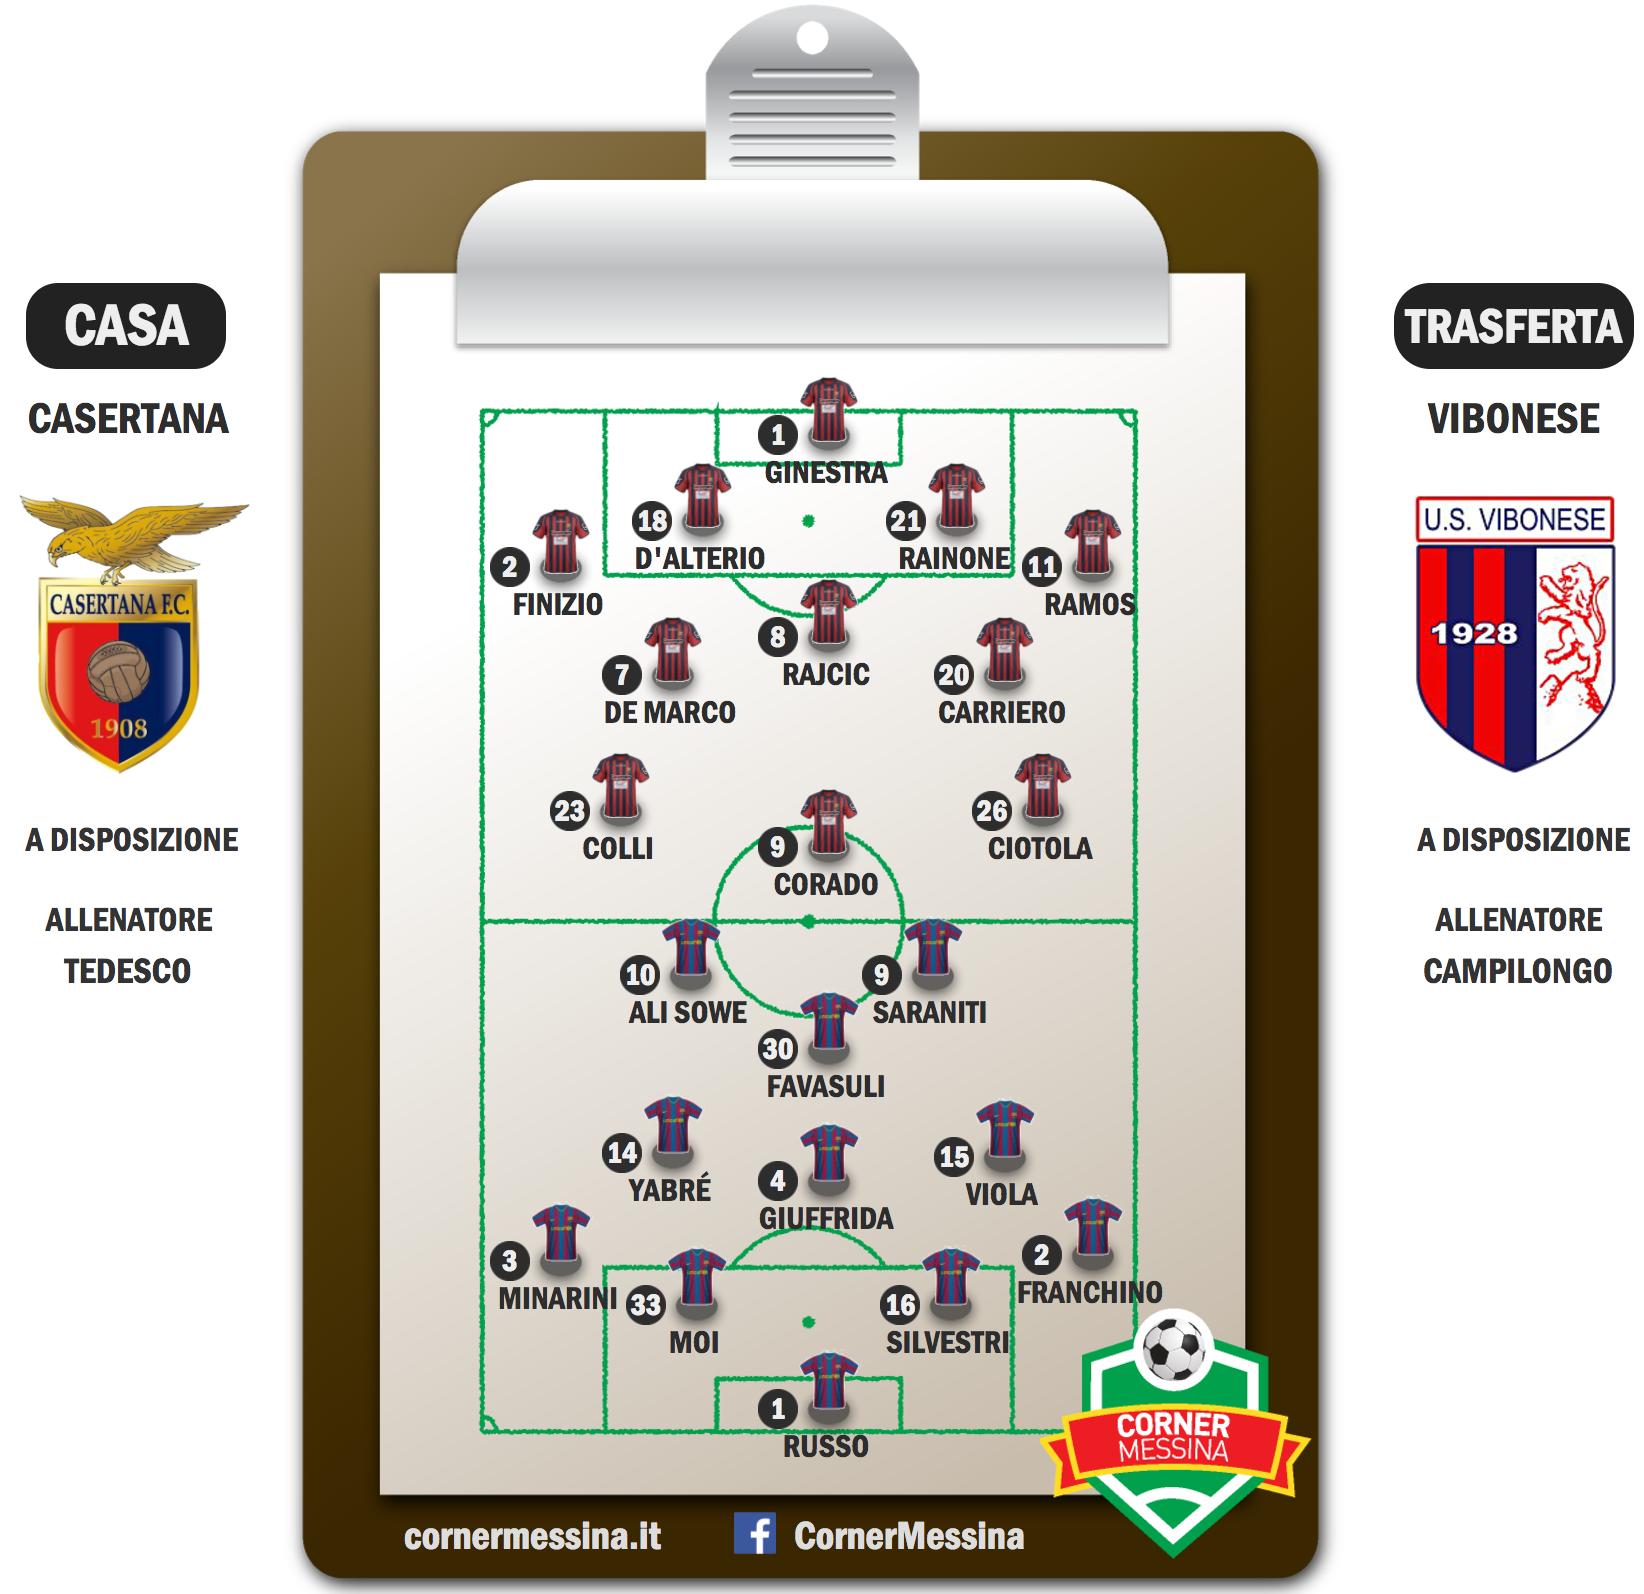 Casertana-Vibonese